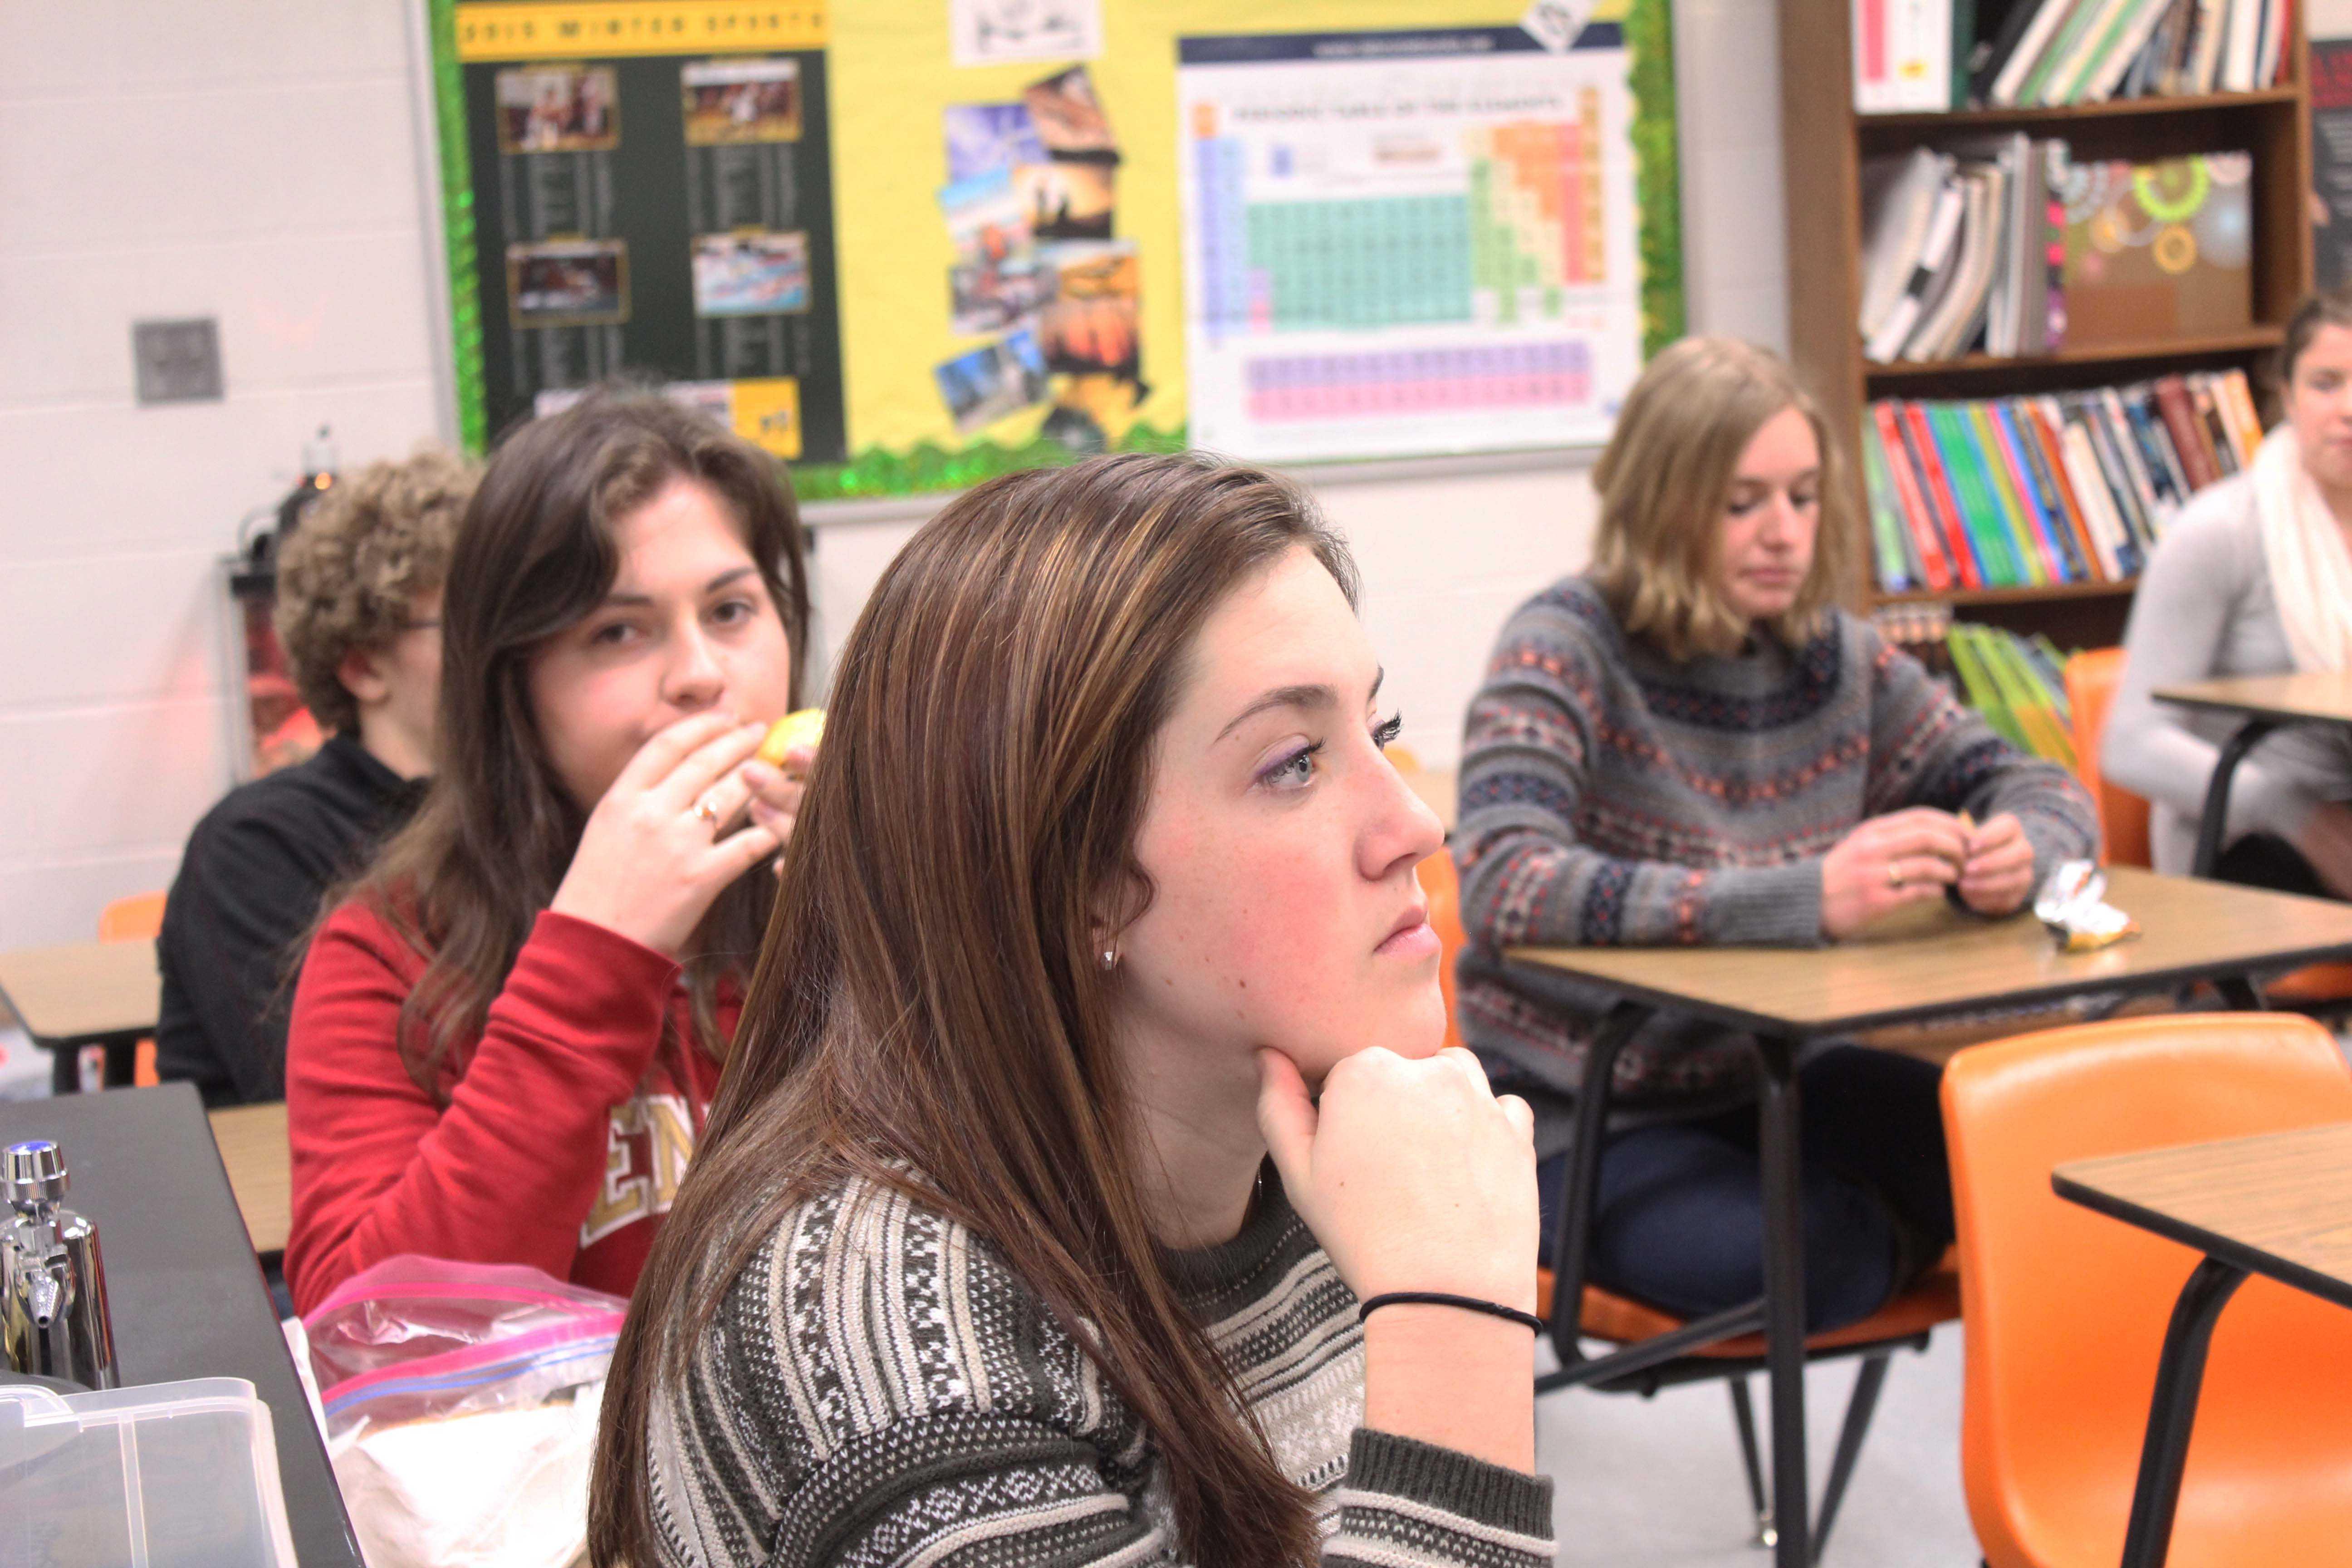 cheyenne mountain high school begins year with dress code